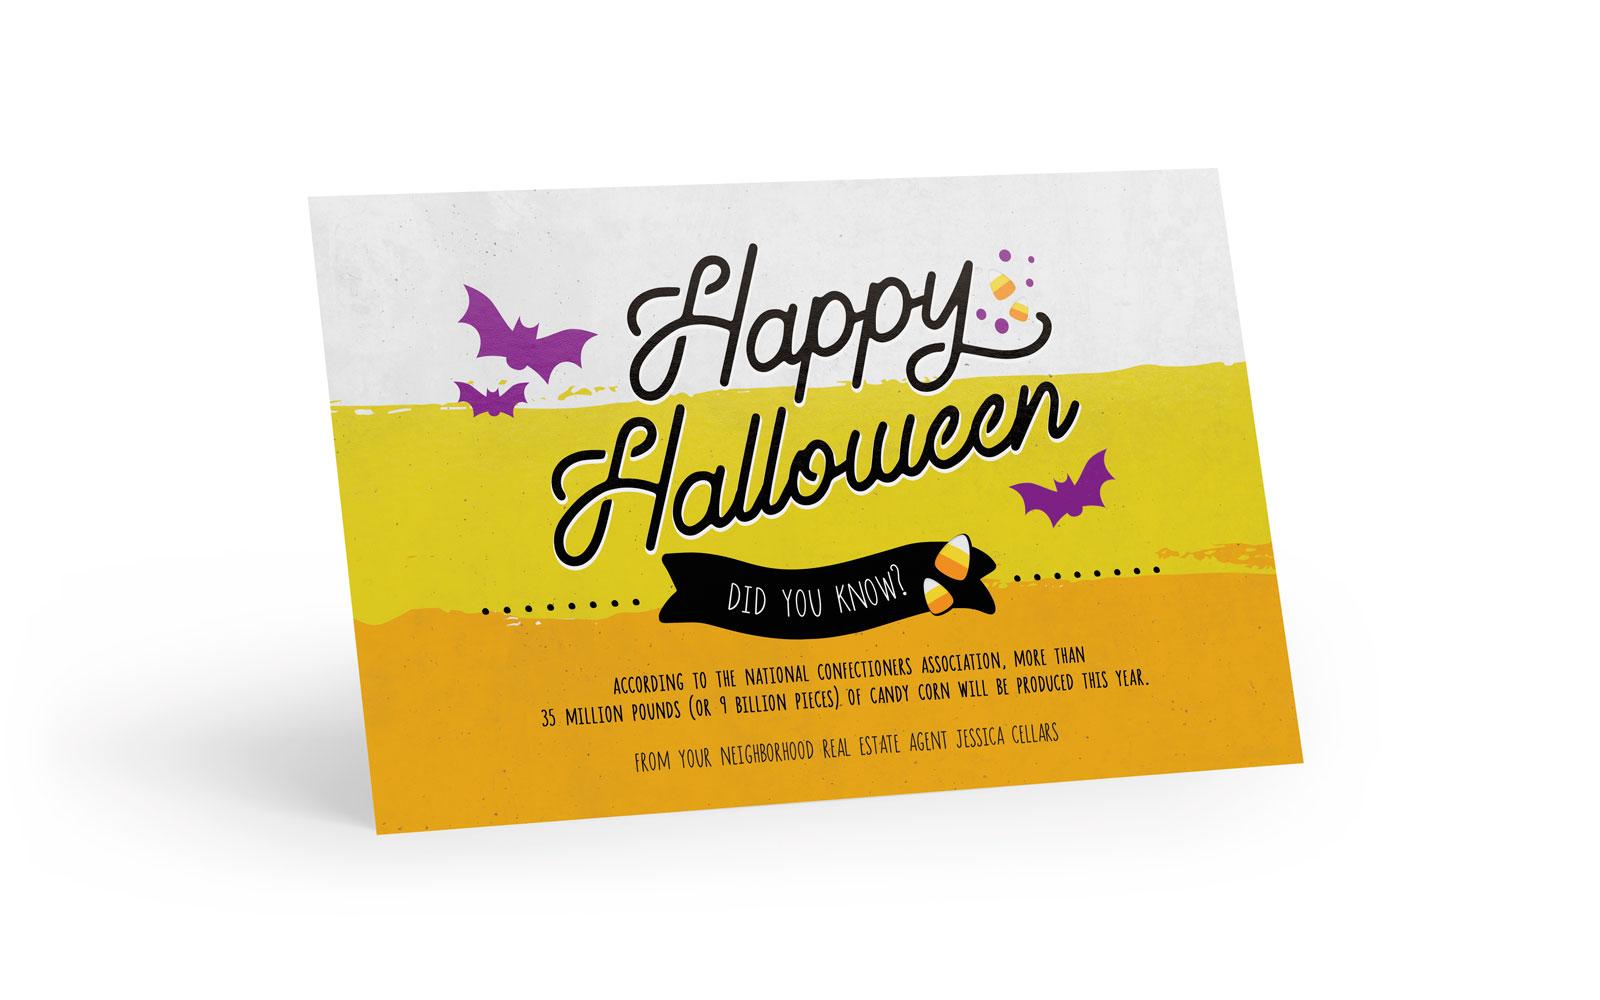 Corefact Seasonal - Halloween Fun Fact